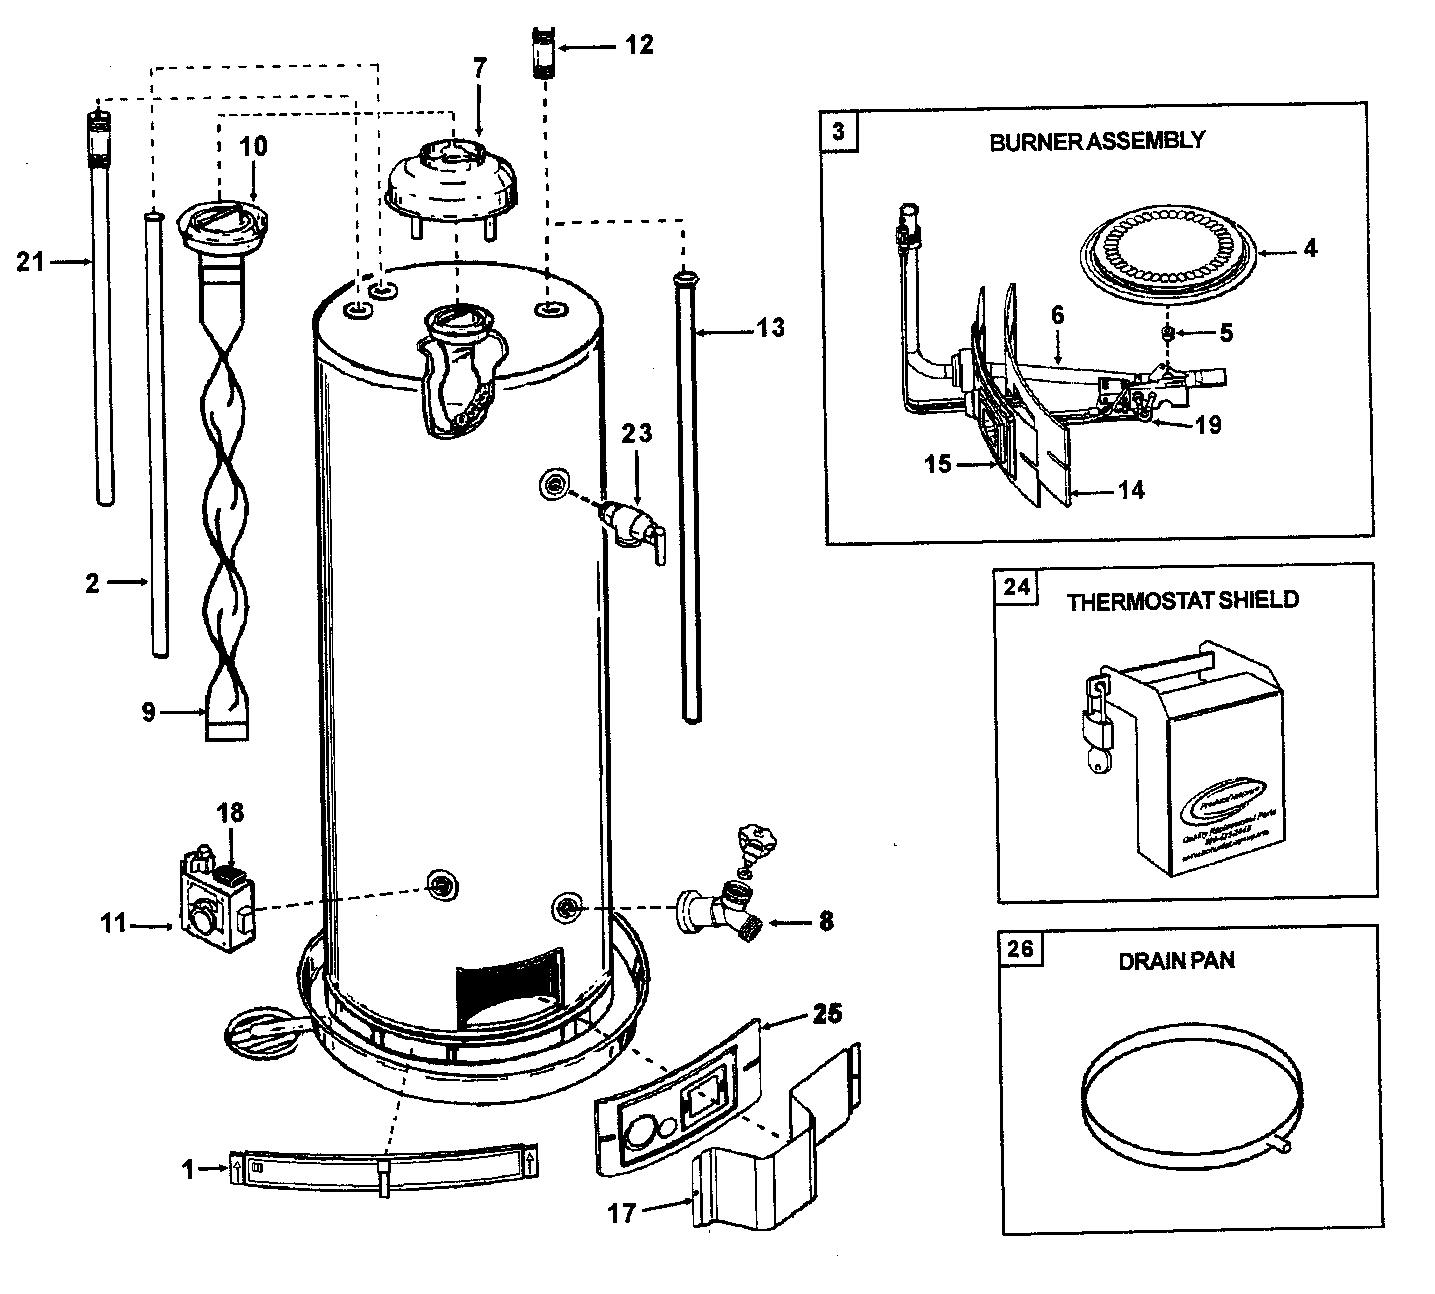 smith ao smith motor parts replacement part schematic schema wiring diagram [ 1435 x 1294 Pixel ]